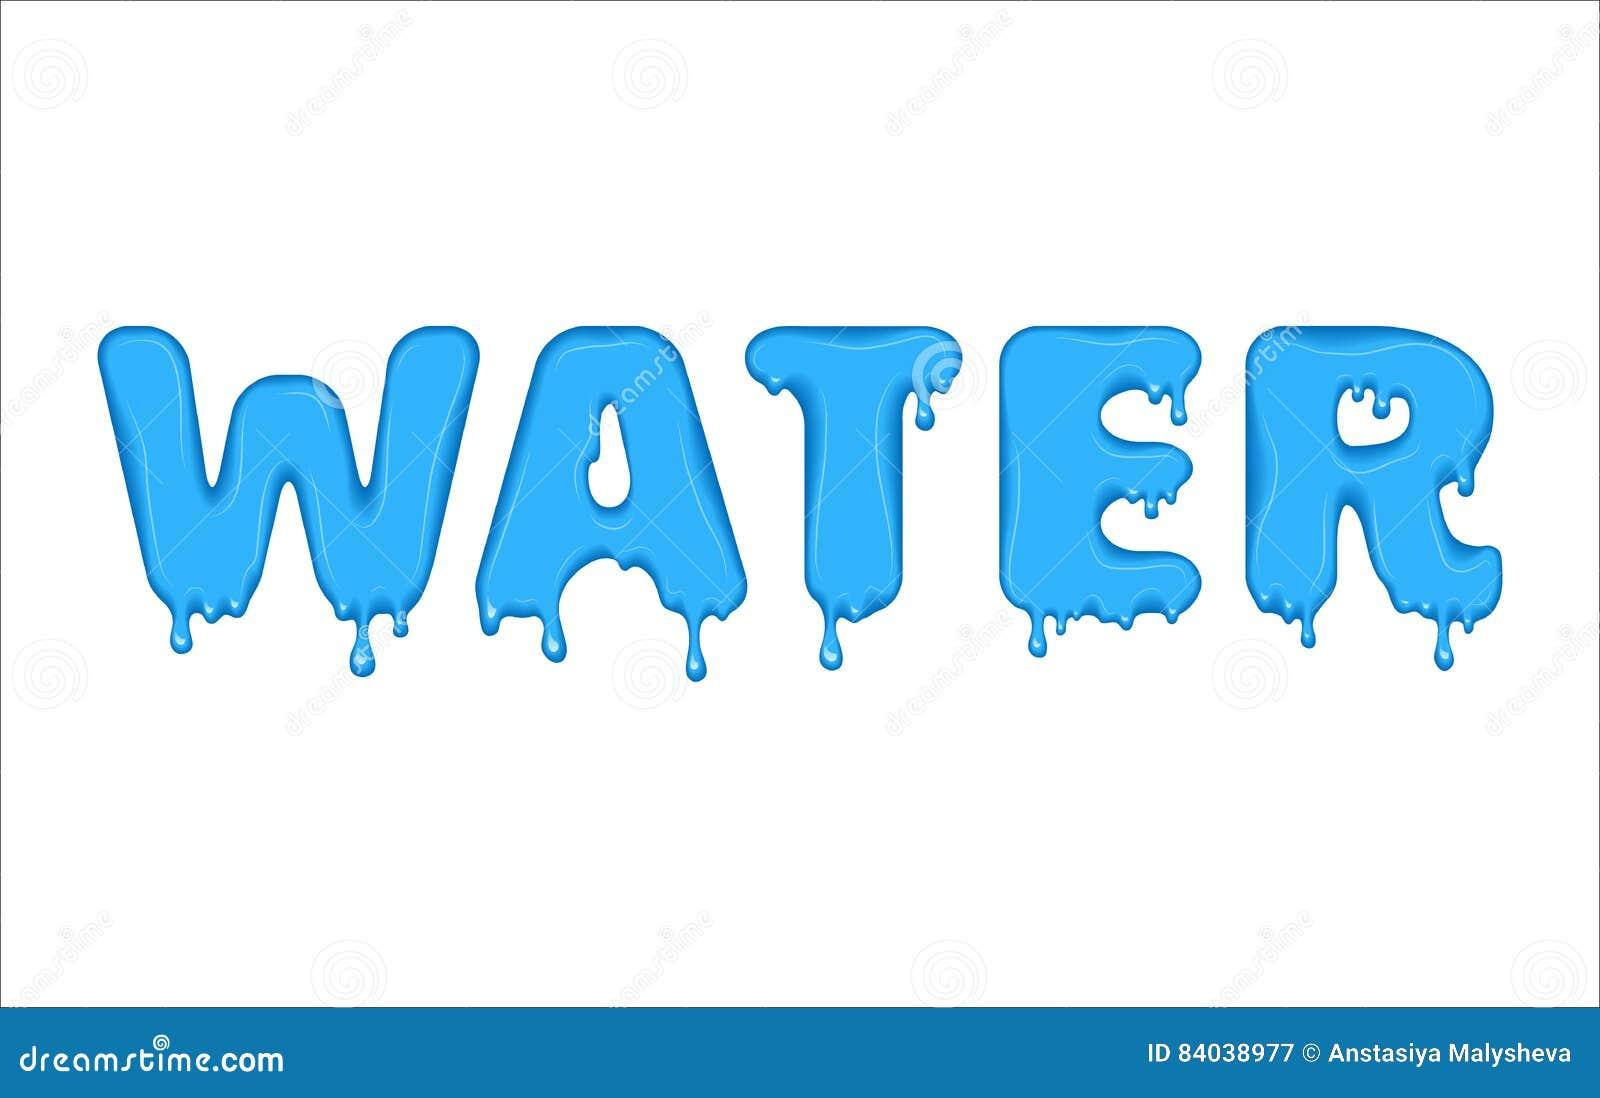 Water bubble writing